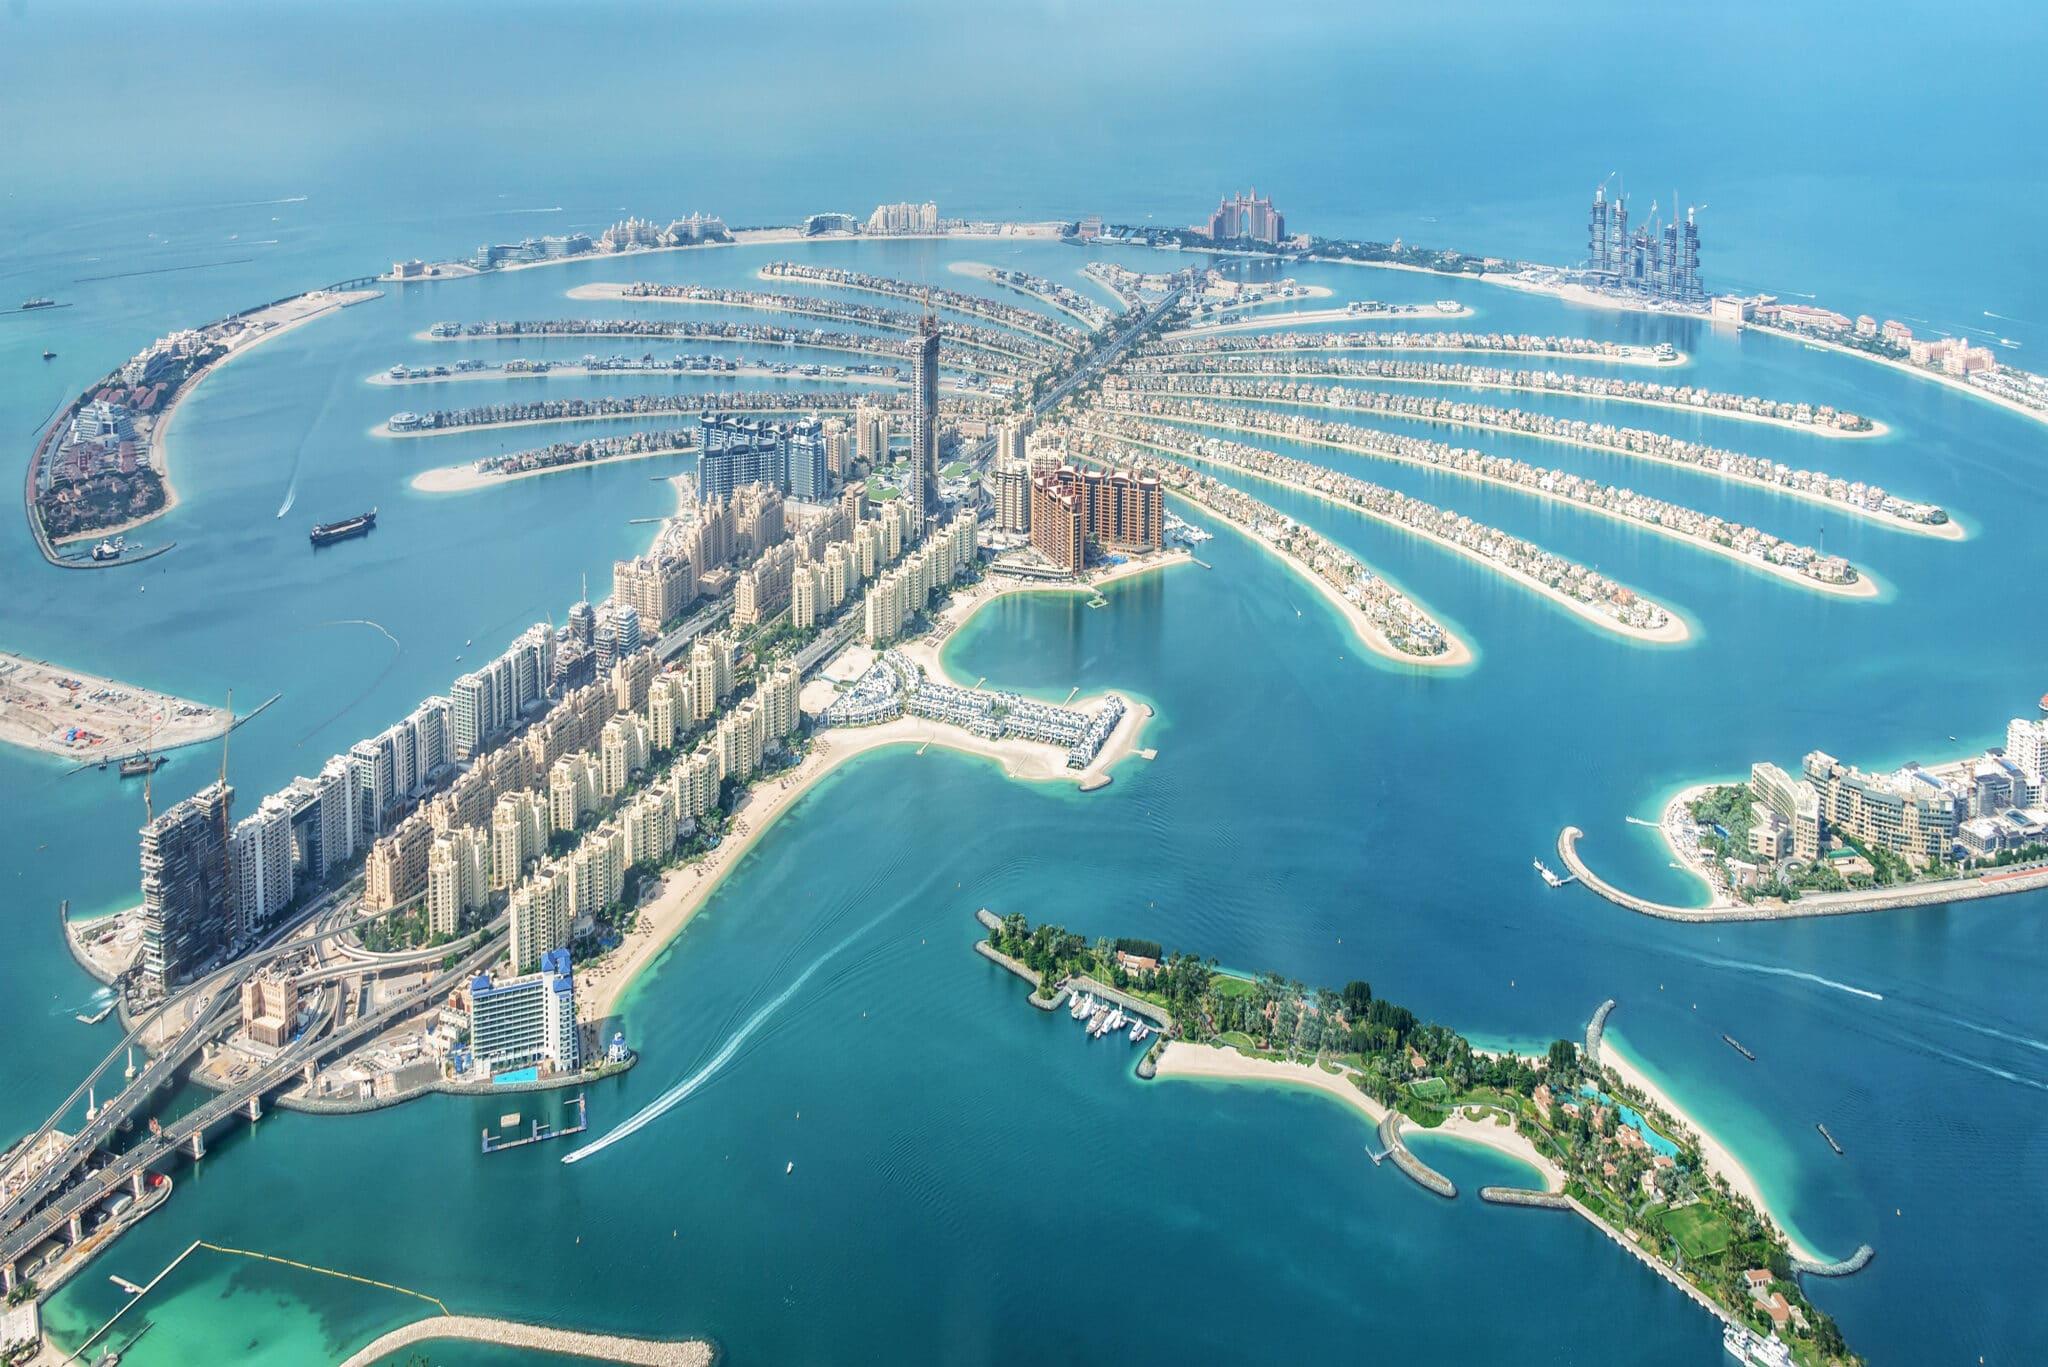 familieoplevelser-i-Dubai - AdobeStock_244692979.jpeg